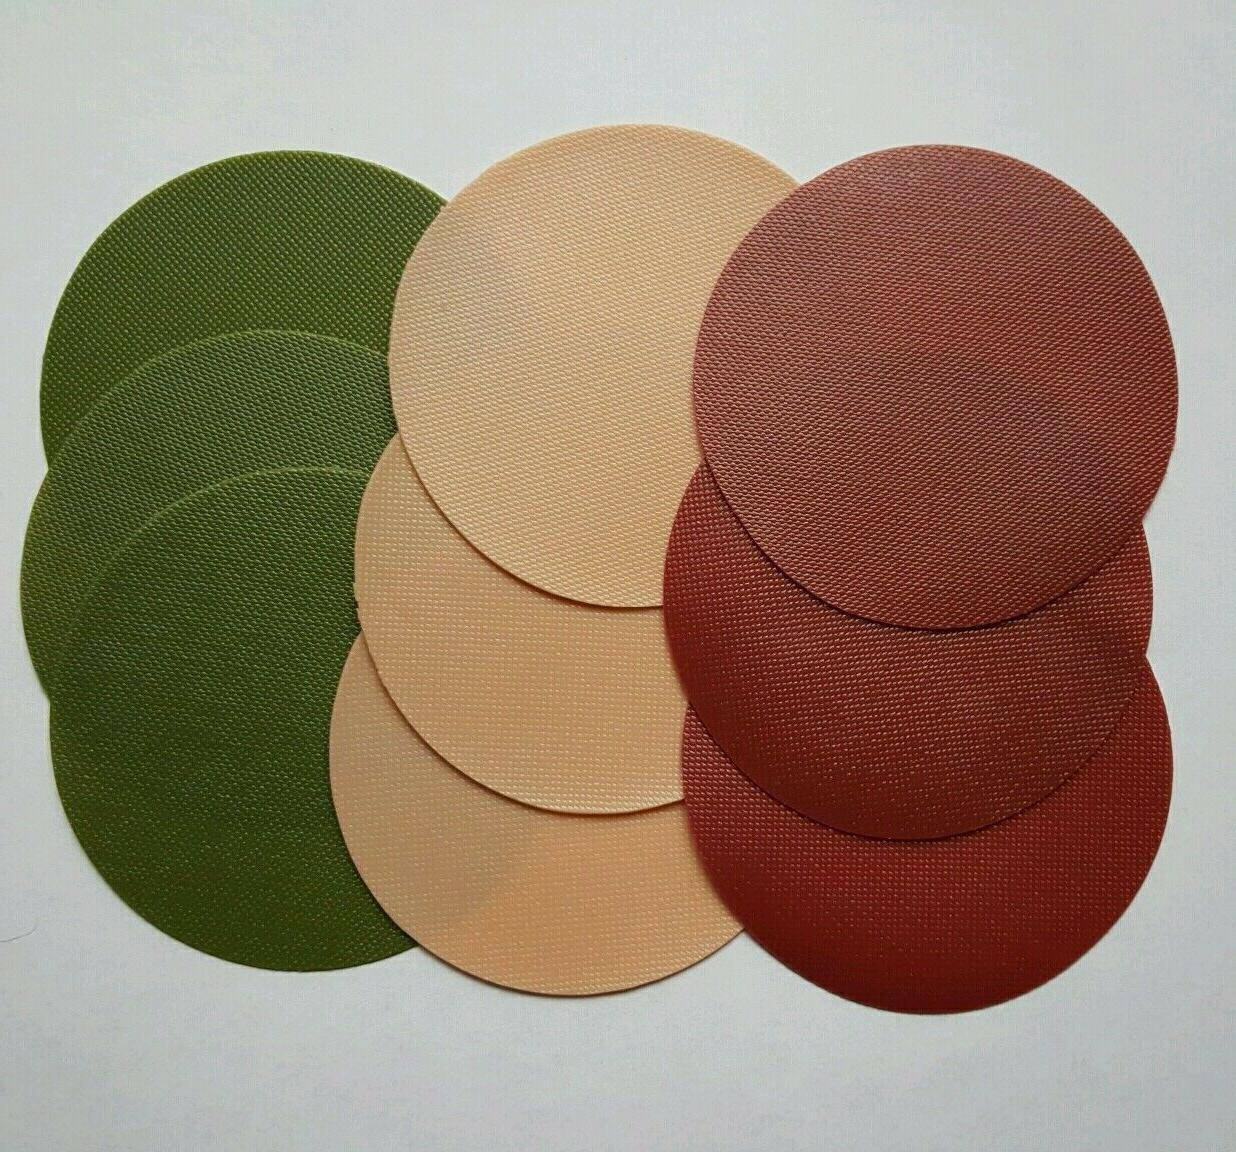 Inflatable Boat Repair Vinyl/PVC Patch: Solstice, Intex, Bes